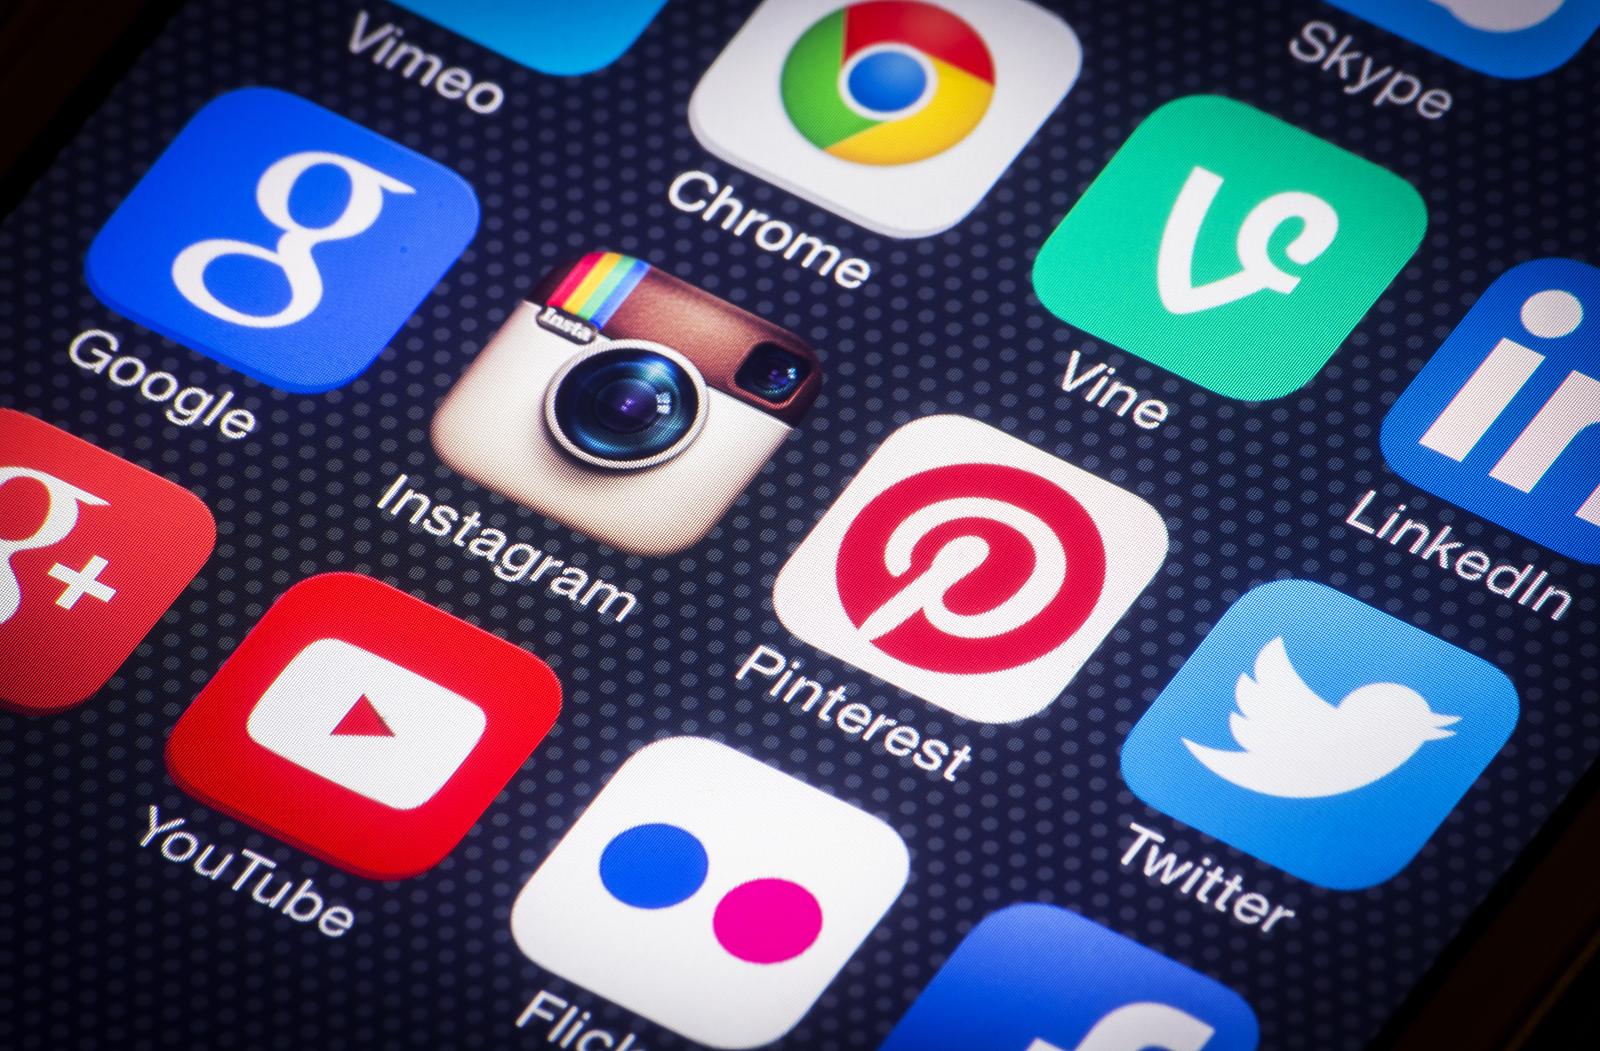 Social Media Icons On Smartphone Presence Web Design